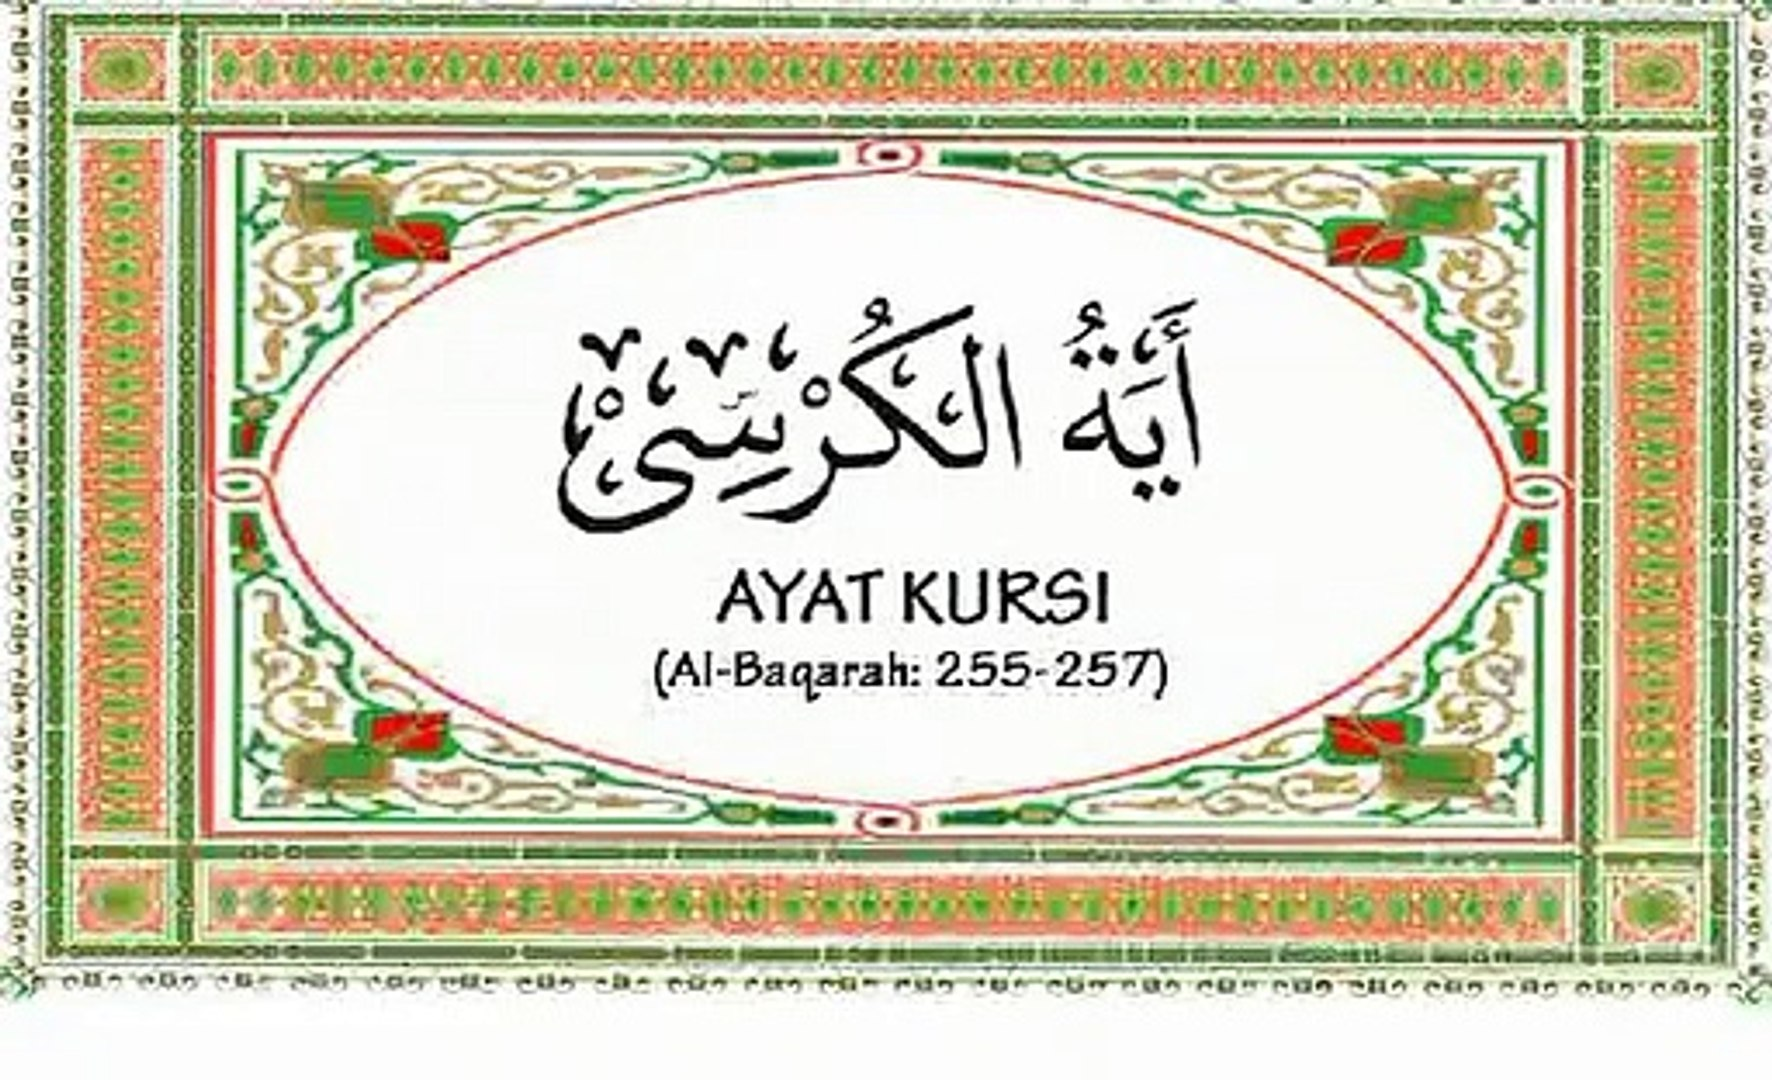 Ayat Kursi Al Baqoroh 255 257 By Mohamad Thoha Al Junayd